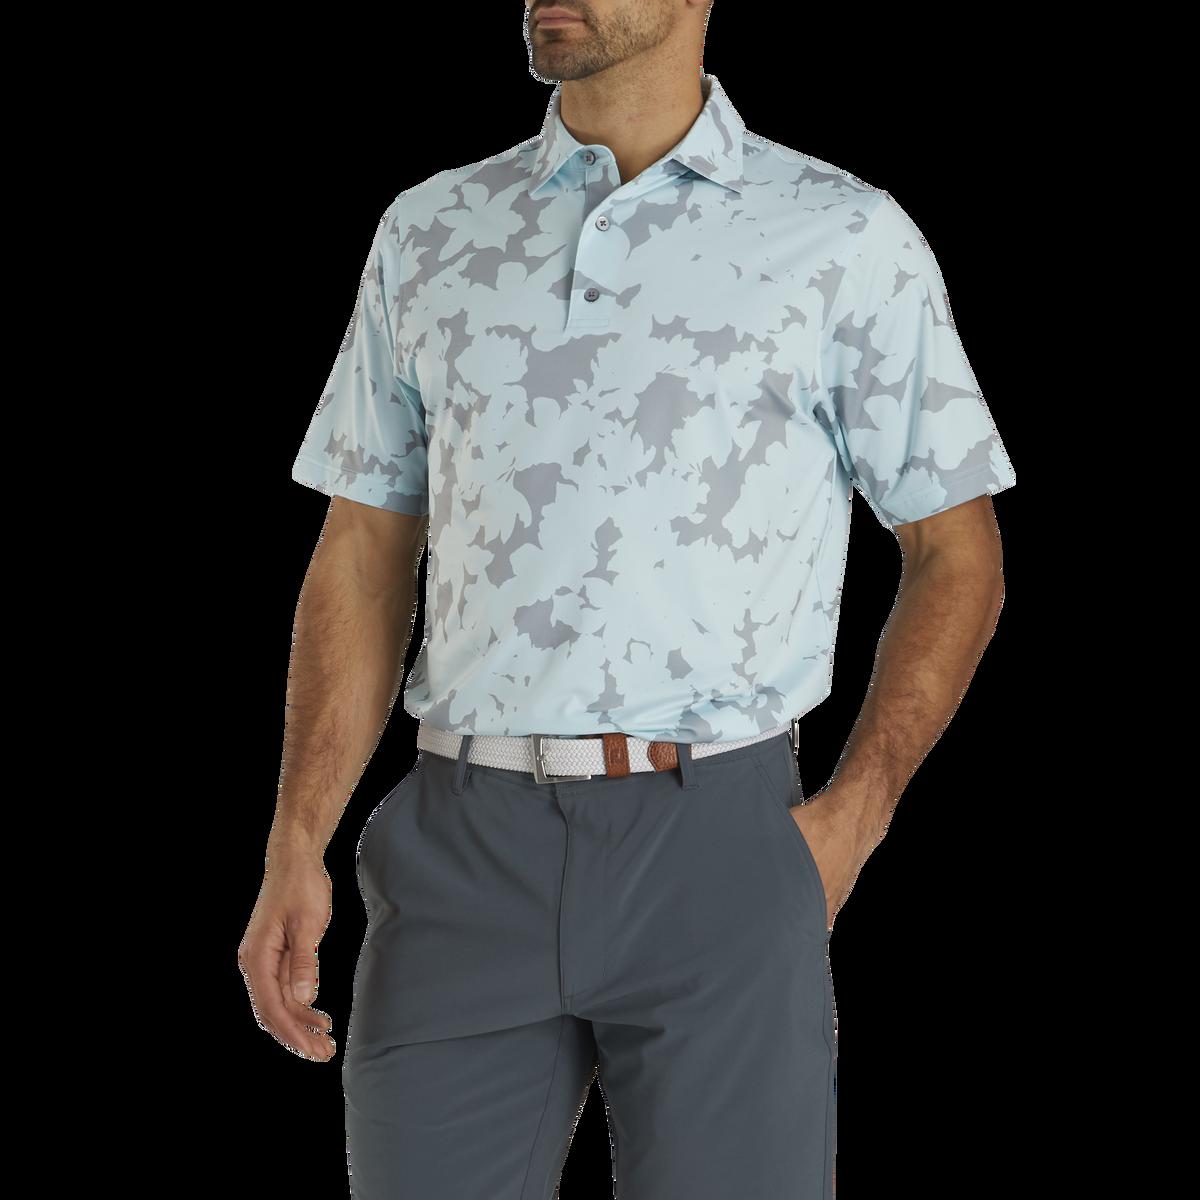 Athletic Fit Lisle Camofloral Print Self Collar